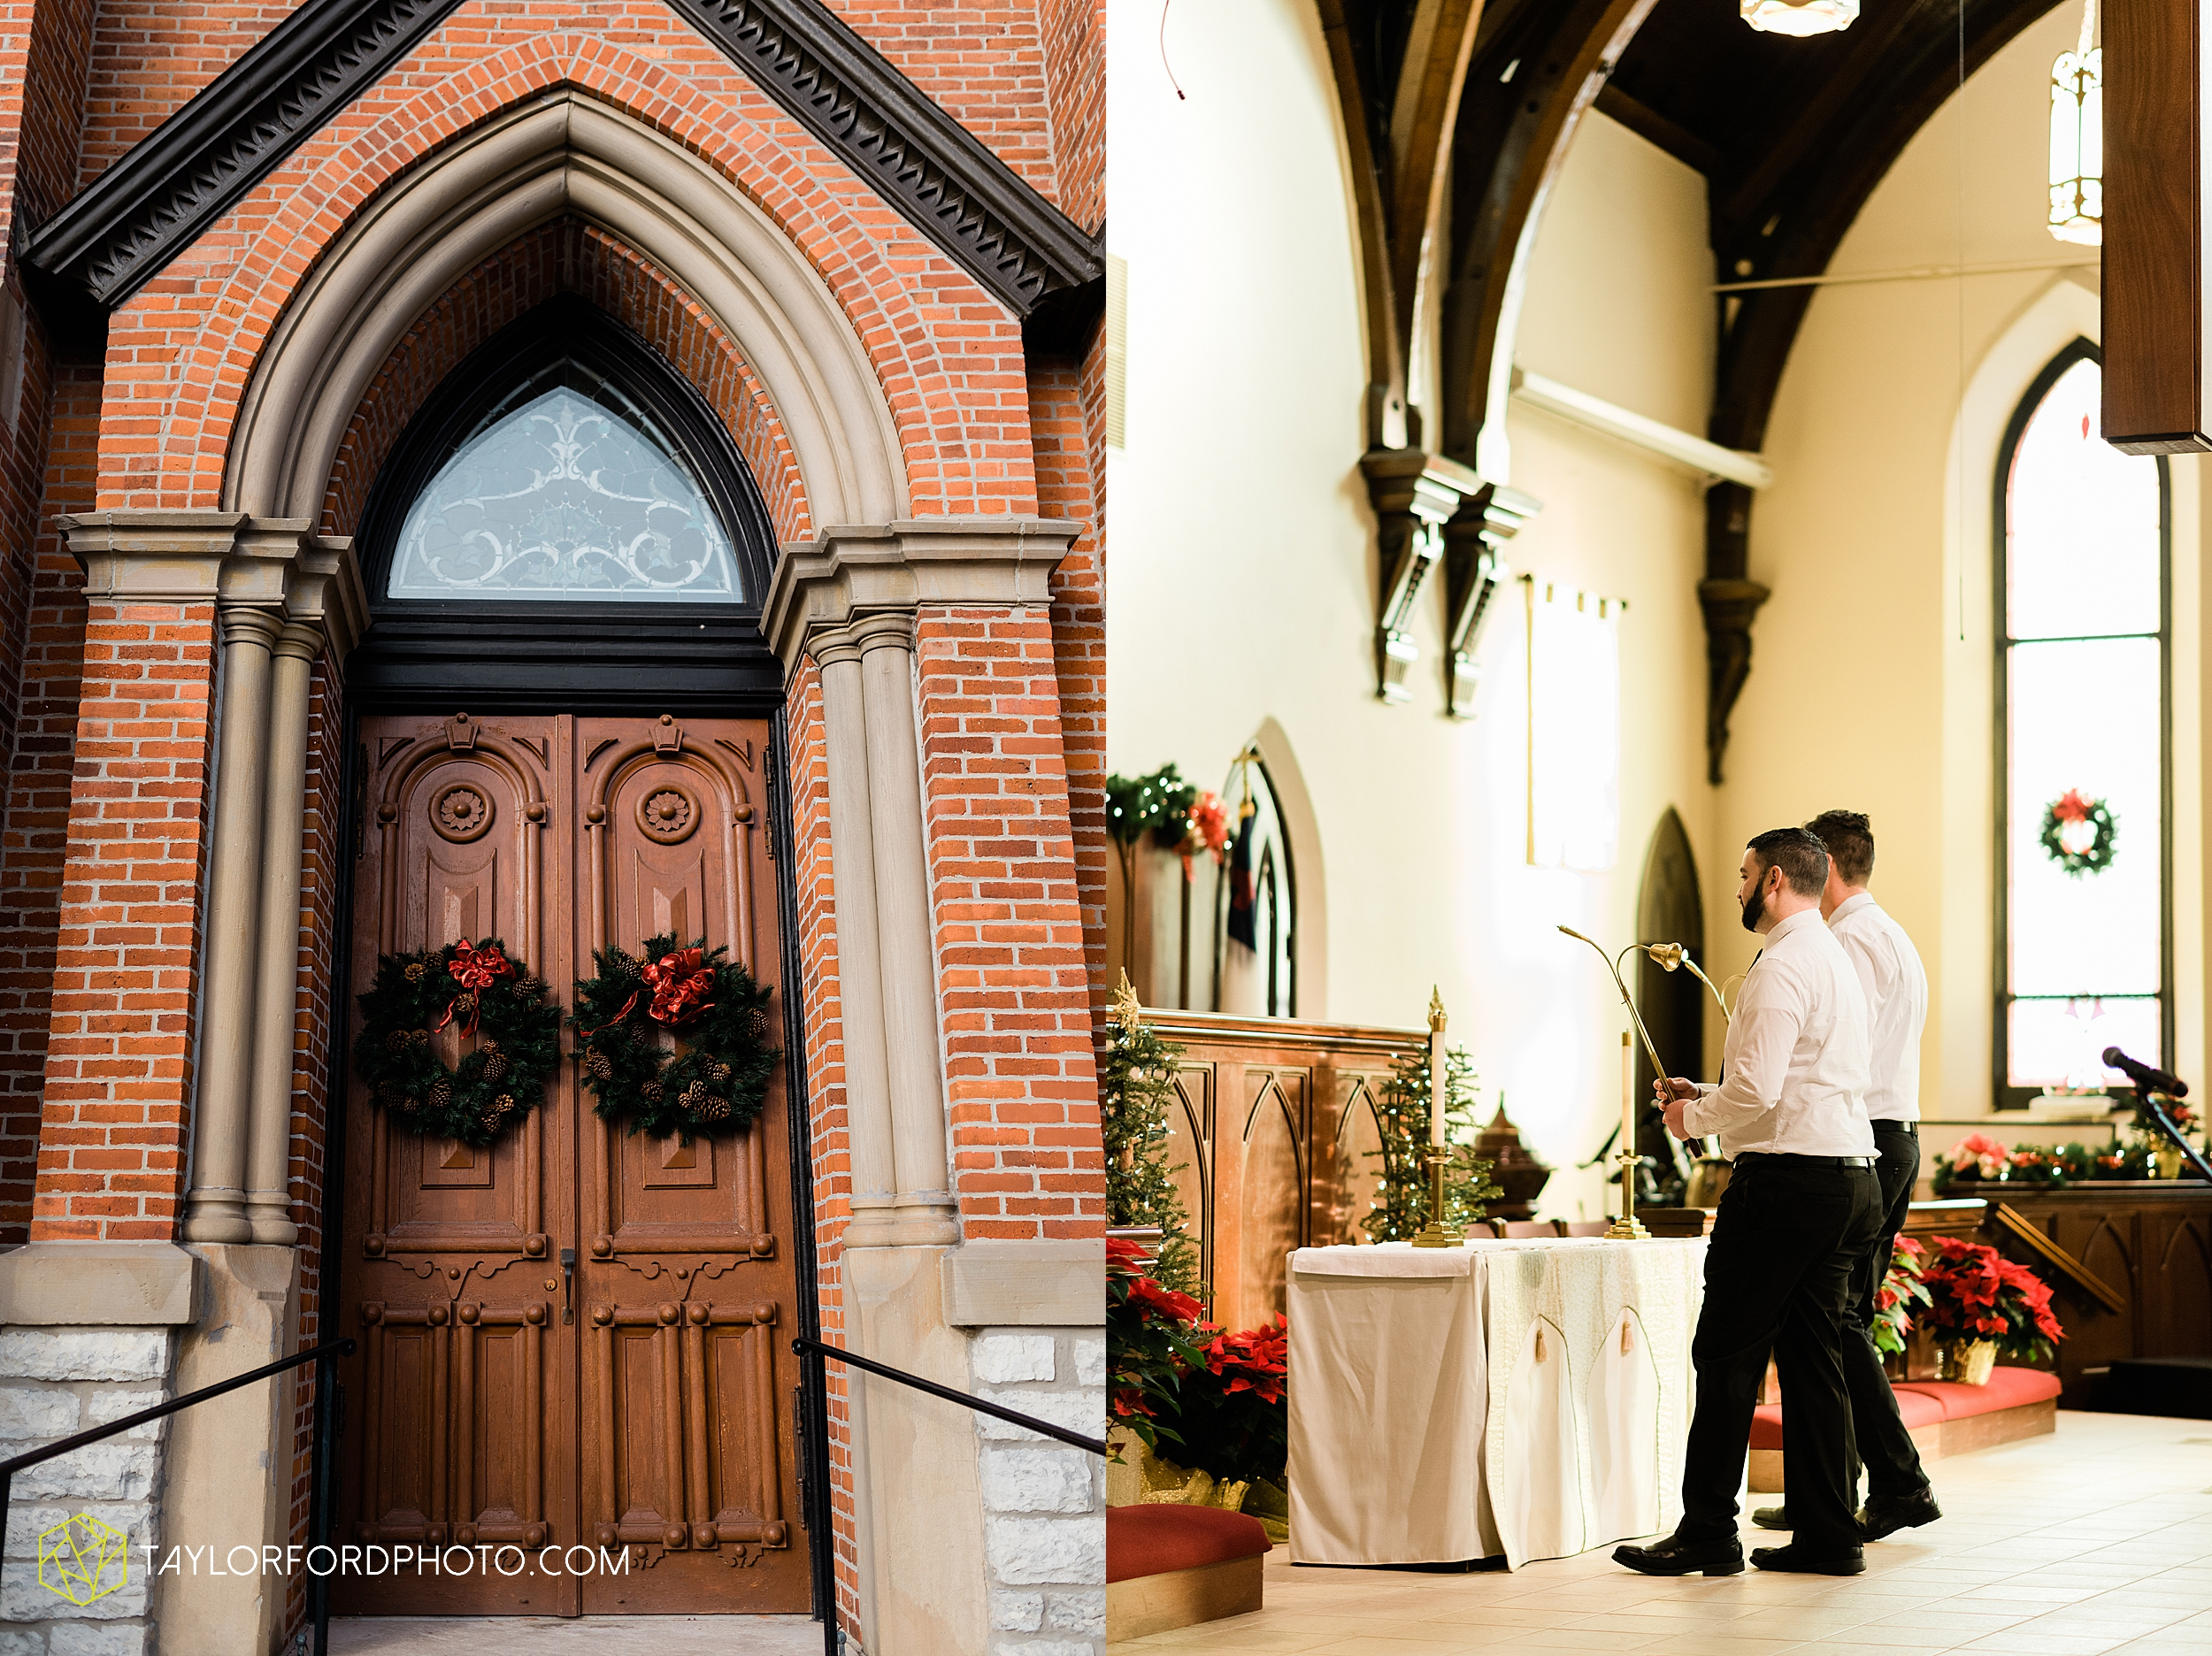 van-wert-ohio-first-united-methodist-downtown-van-wert-county-jr-fair-building-reception-winter-christmas-wedding-photographer-taylor-ford-hirschy-photographer-taylor-ford-hirschy-photographer_1914.jpg